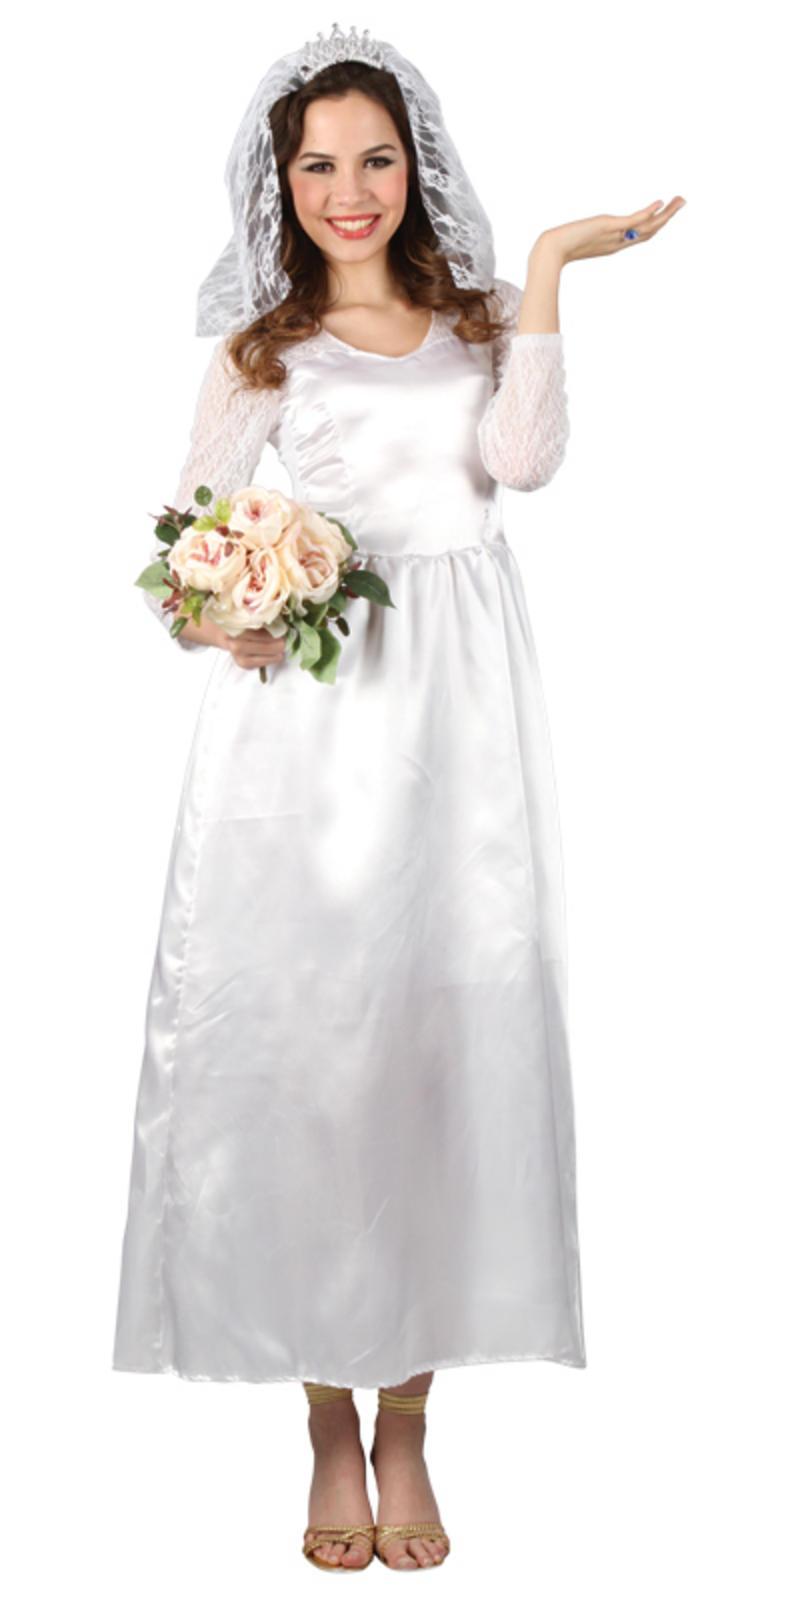 halloween costume wedding dresses photo - 1